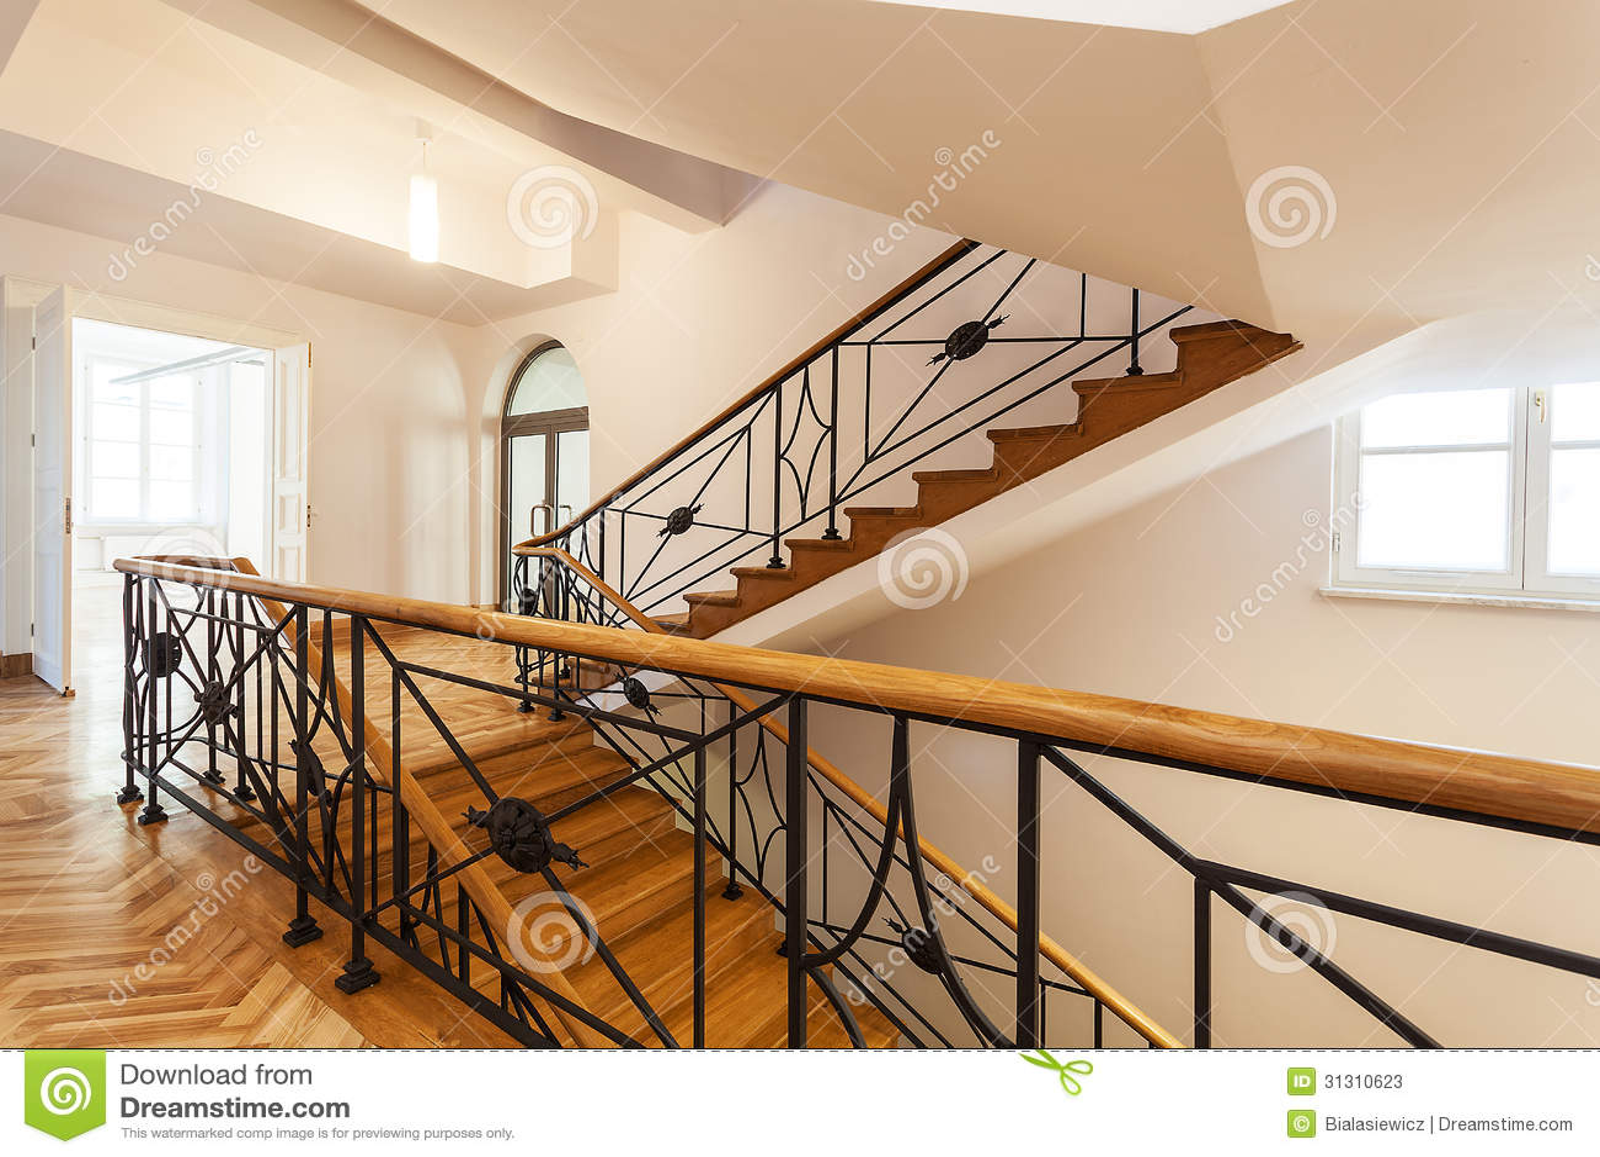 escalier de luxe dans un palais photos stock image 31310623. Black Bedroom Furniture Sets. Home Design Ideas